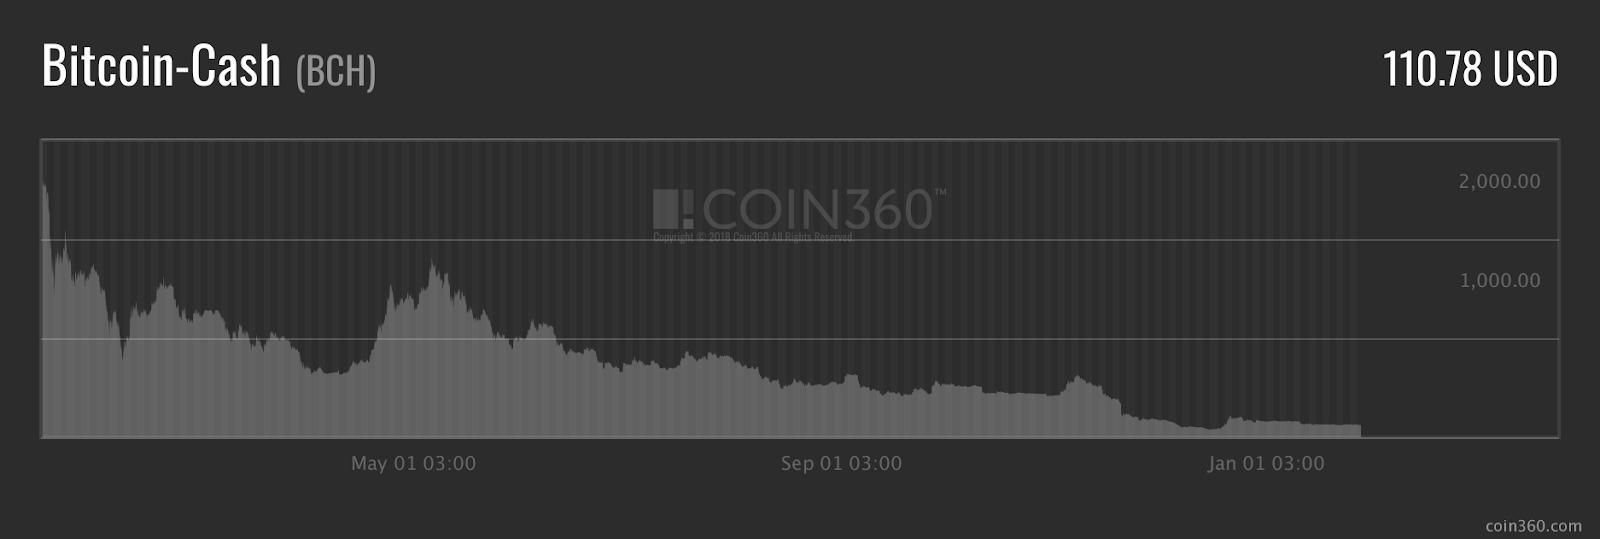 Bitcoin Cash (BCH) Price Graph